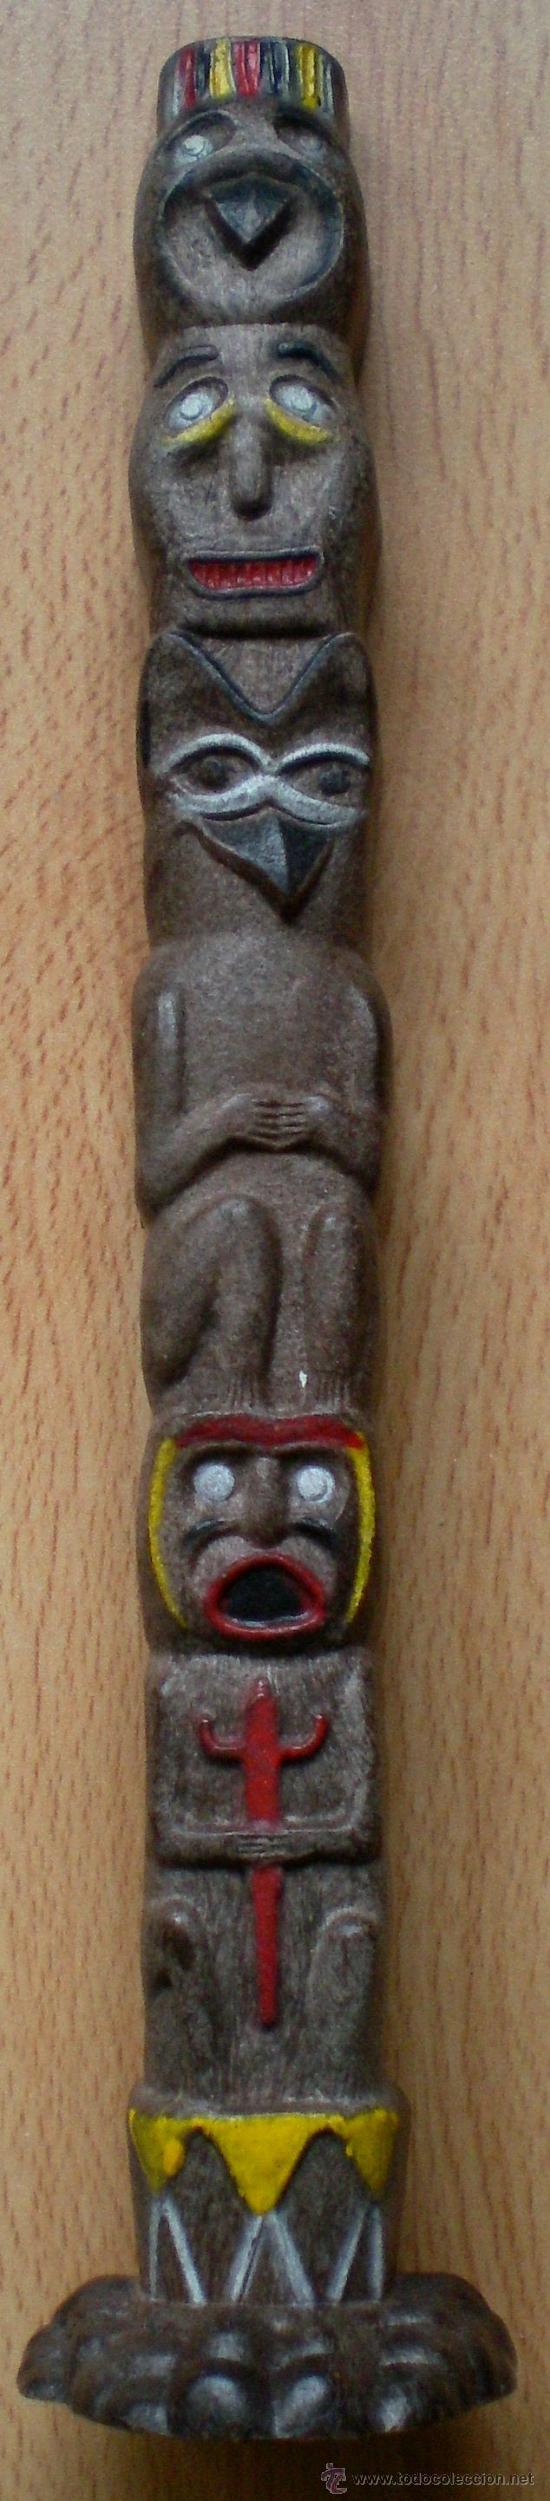 Madelman: Totem indio de Madelman - Foto 2 - 31354238